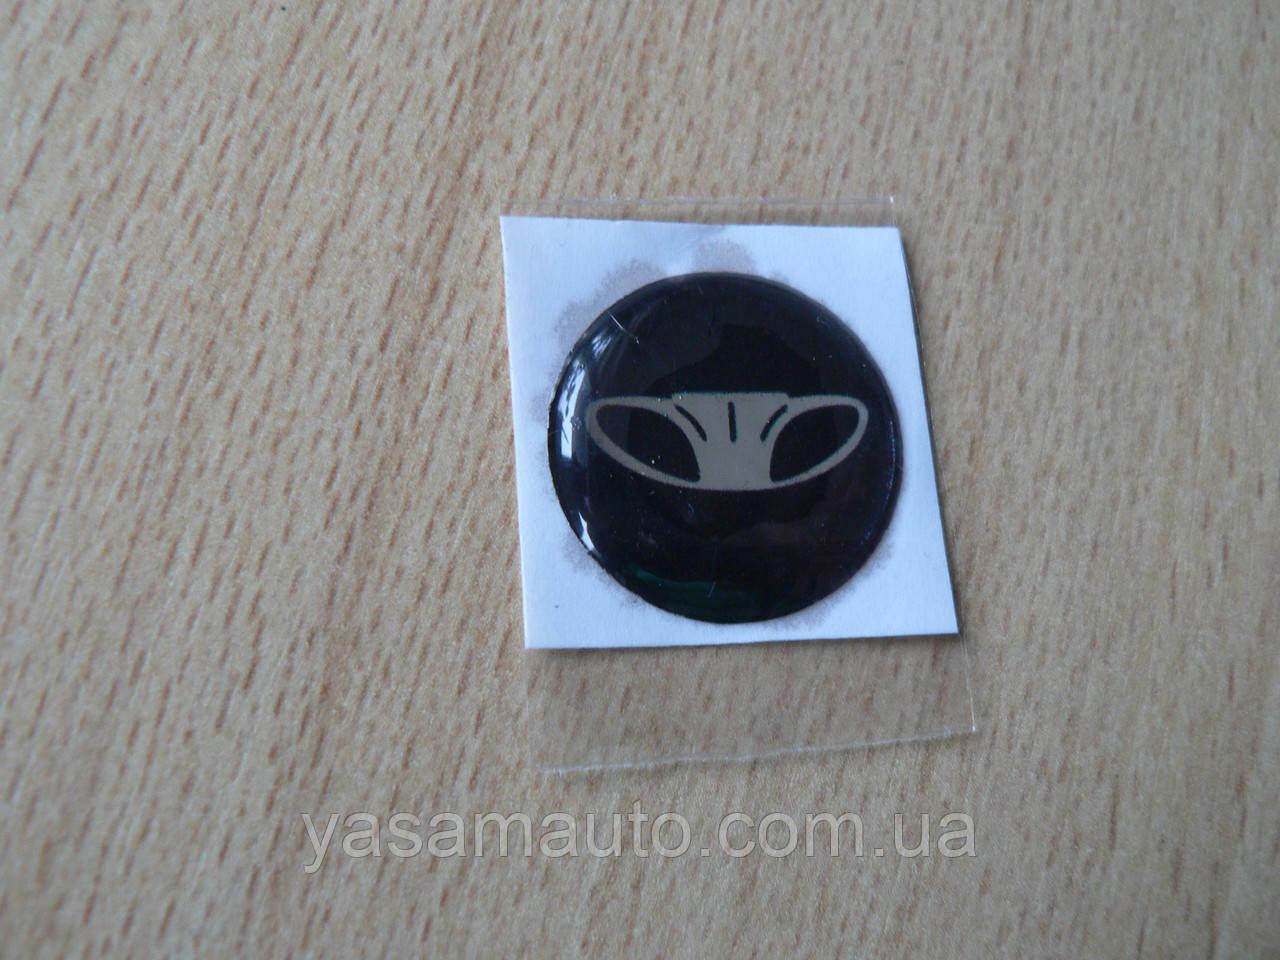 Наклейка s круглая Daewoo 15х15х1.2мм силиконоая в круге на авто ключи сигнализацию Деу Дэу